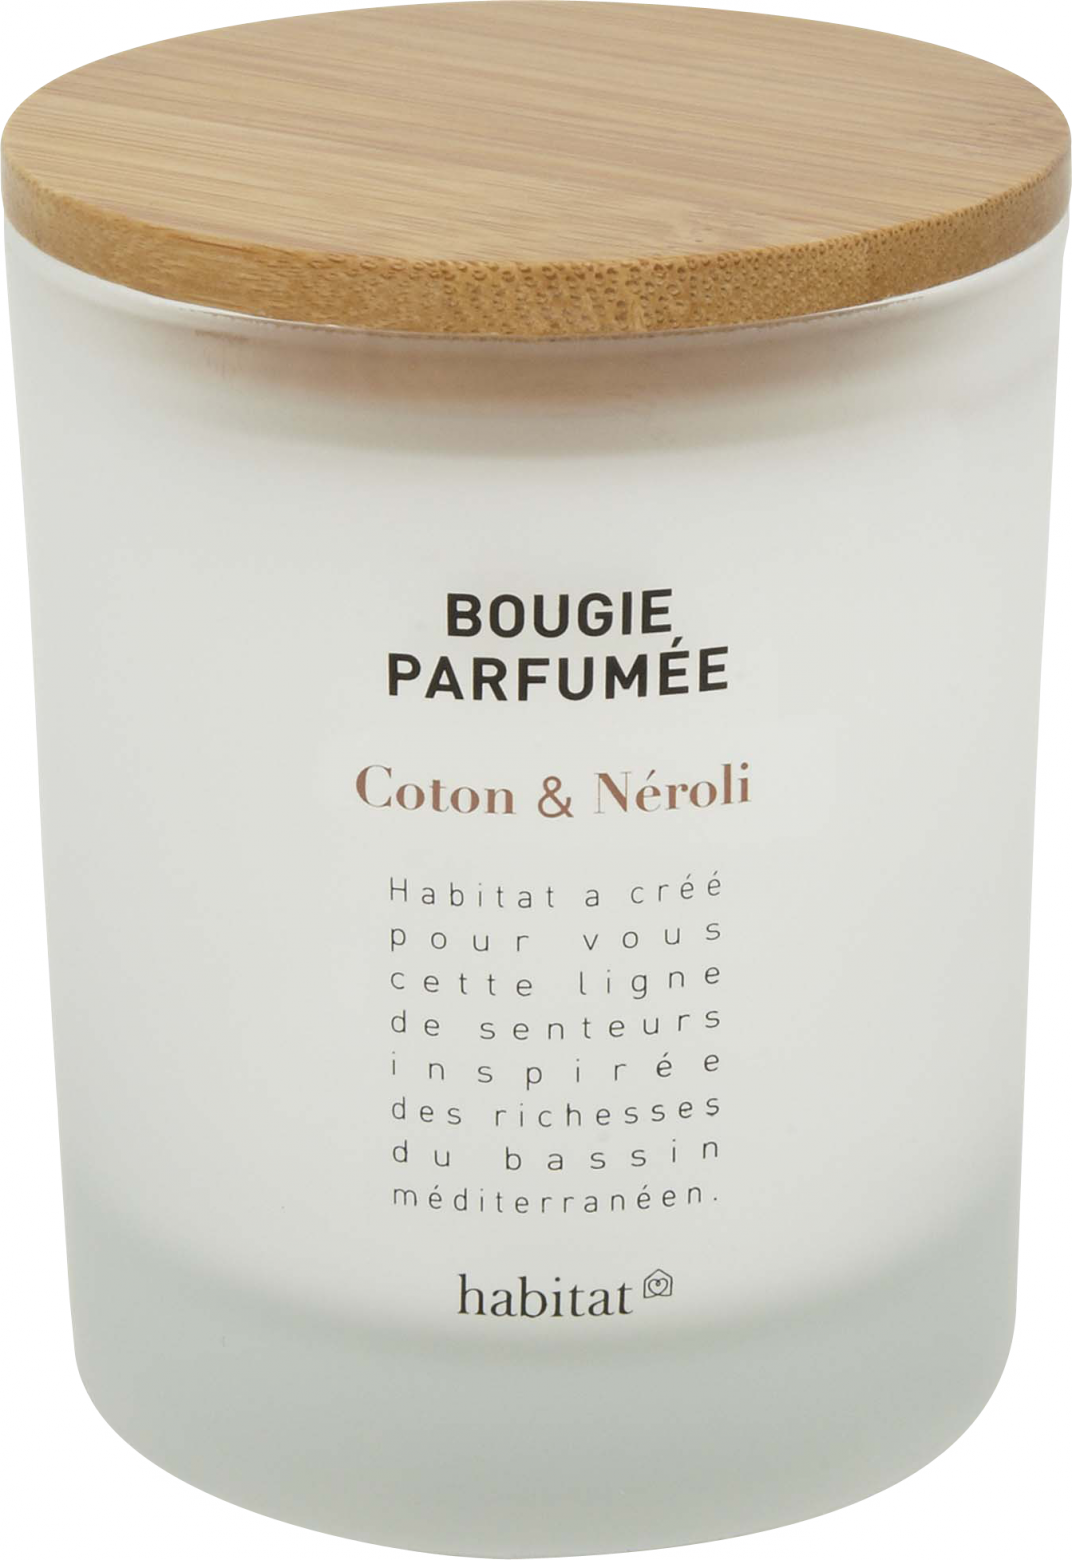 Bougie parfumée Habitat - 20,90€